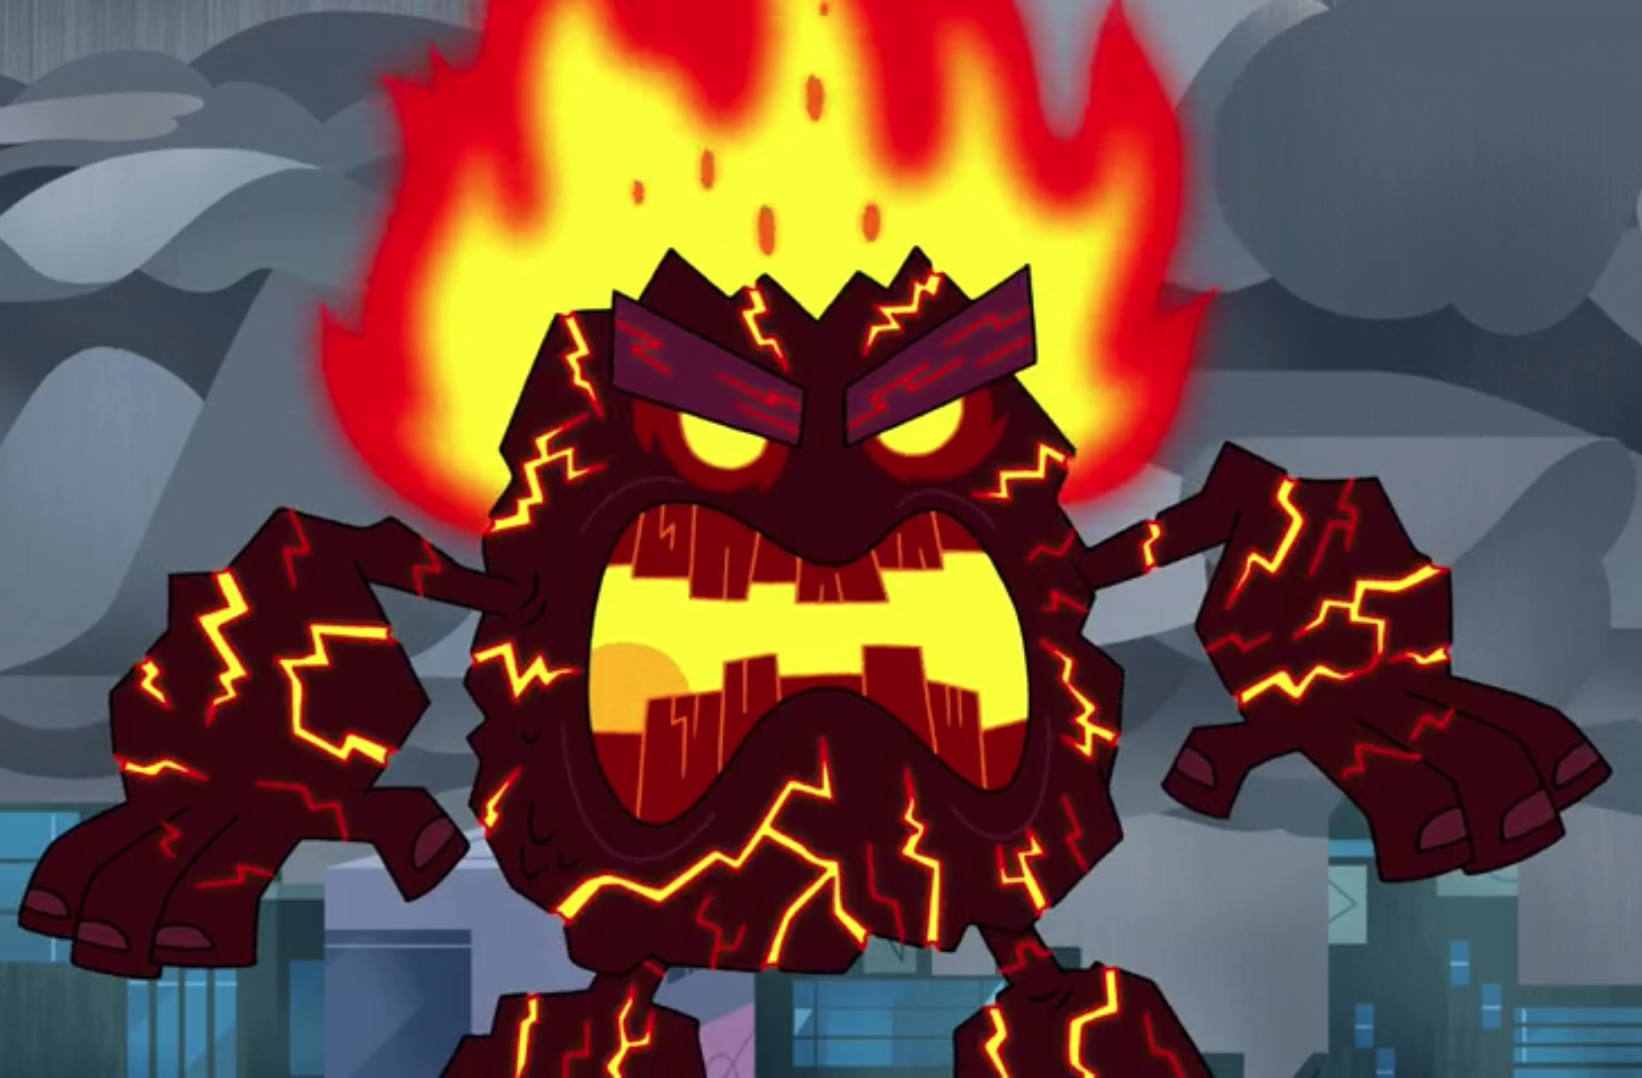 Lava Monster (The Powerpuff Girls)